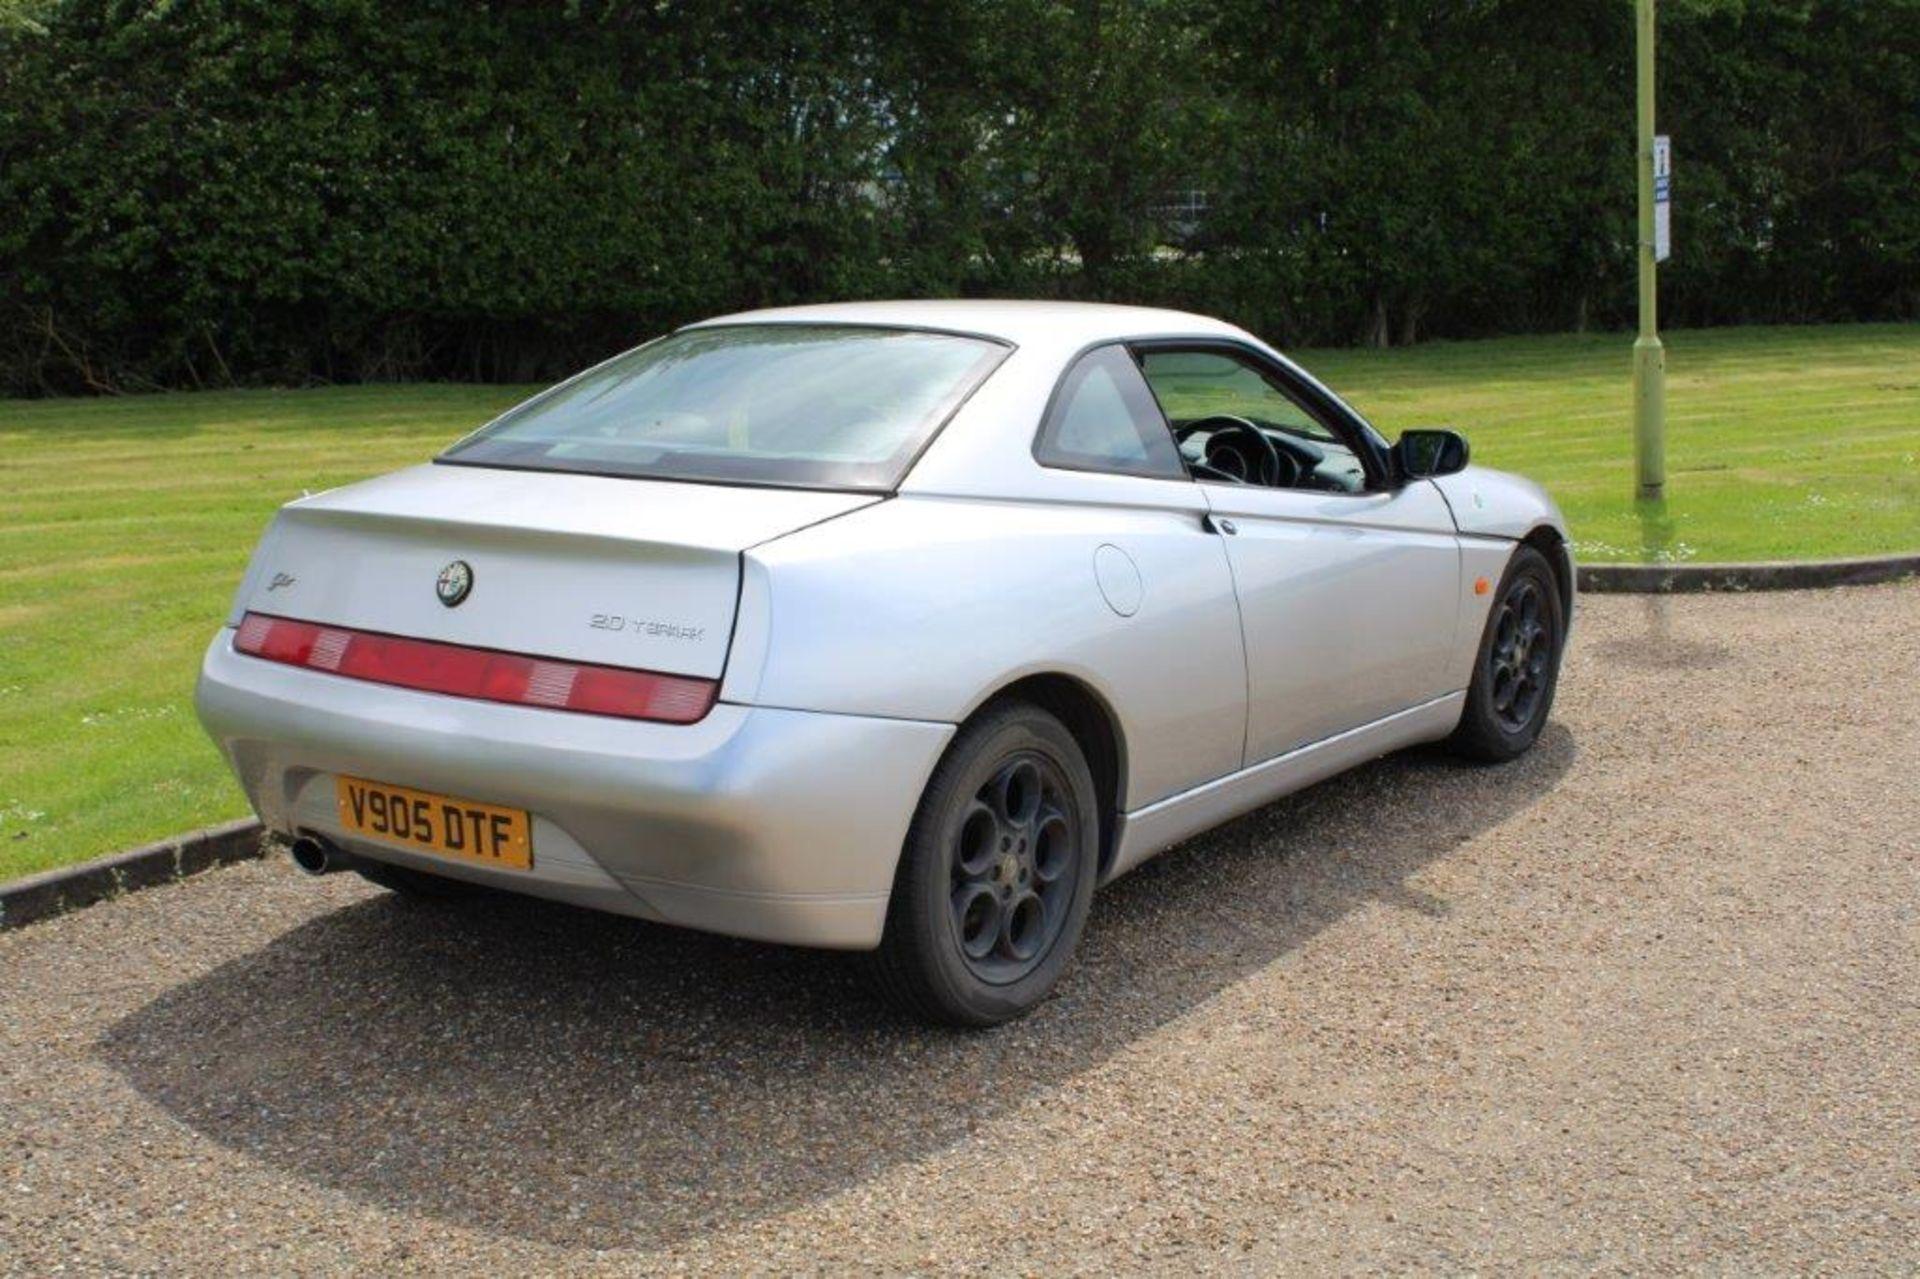 1999 Alfa Romeo GTV Lusso T-Spark 16v - Image 4 of 18